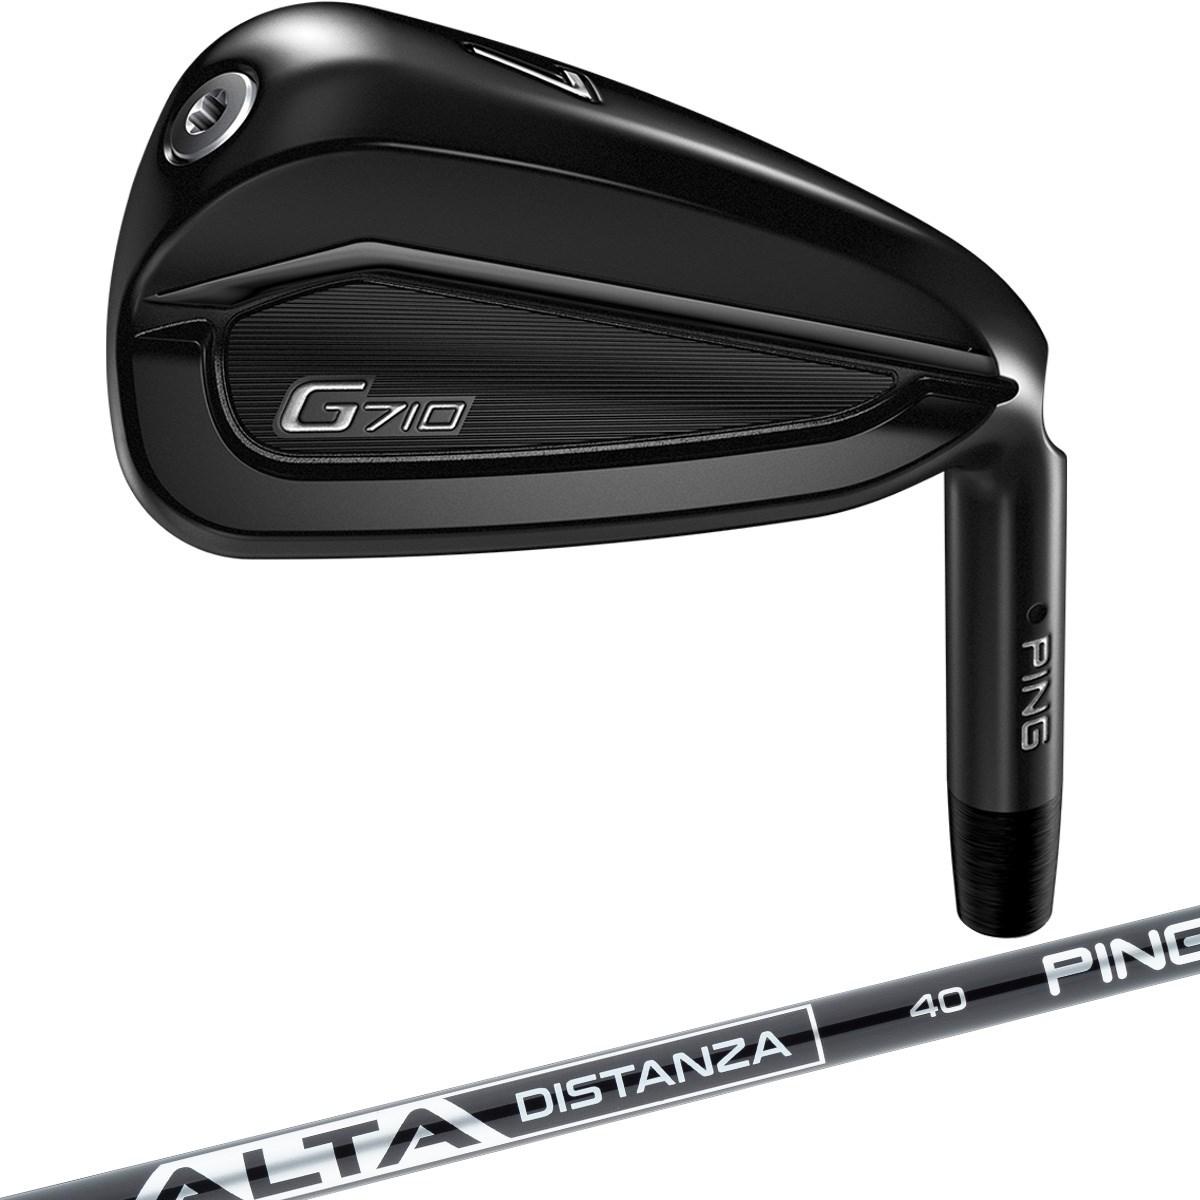 G710 アイアン(5本セット) ALTA DISTANZA BLACK 40